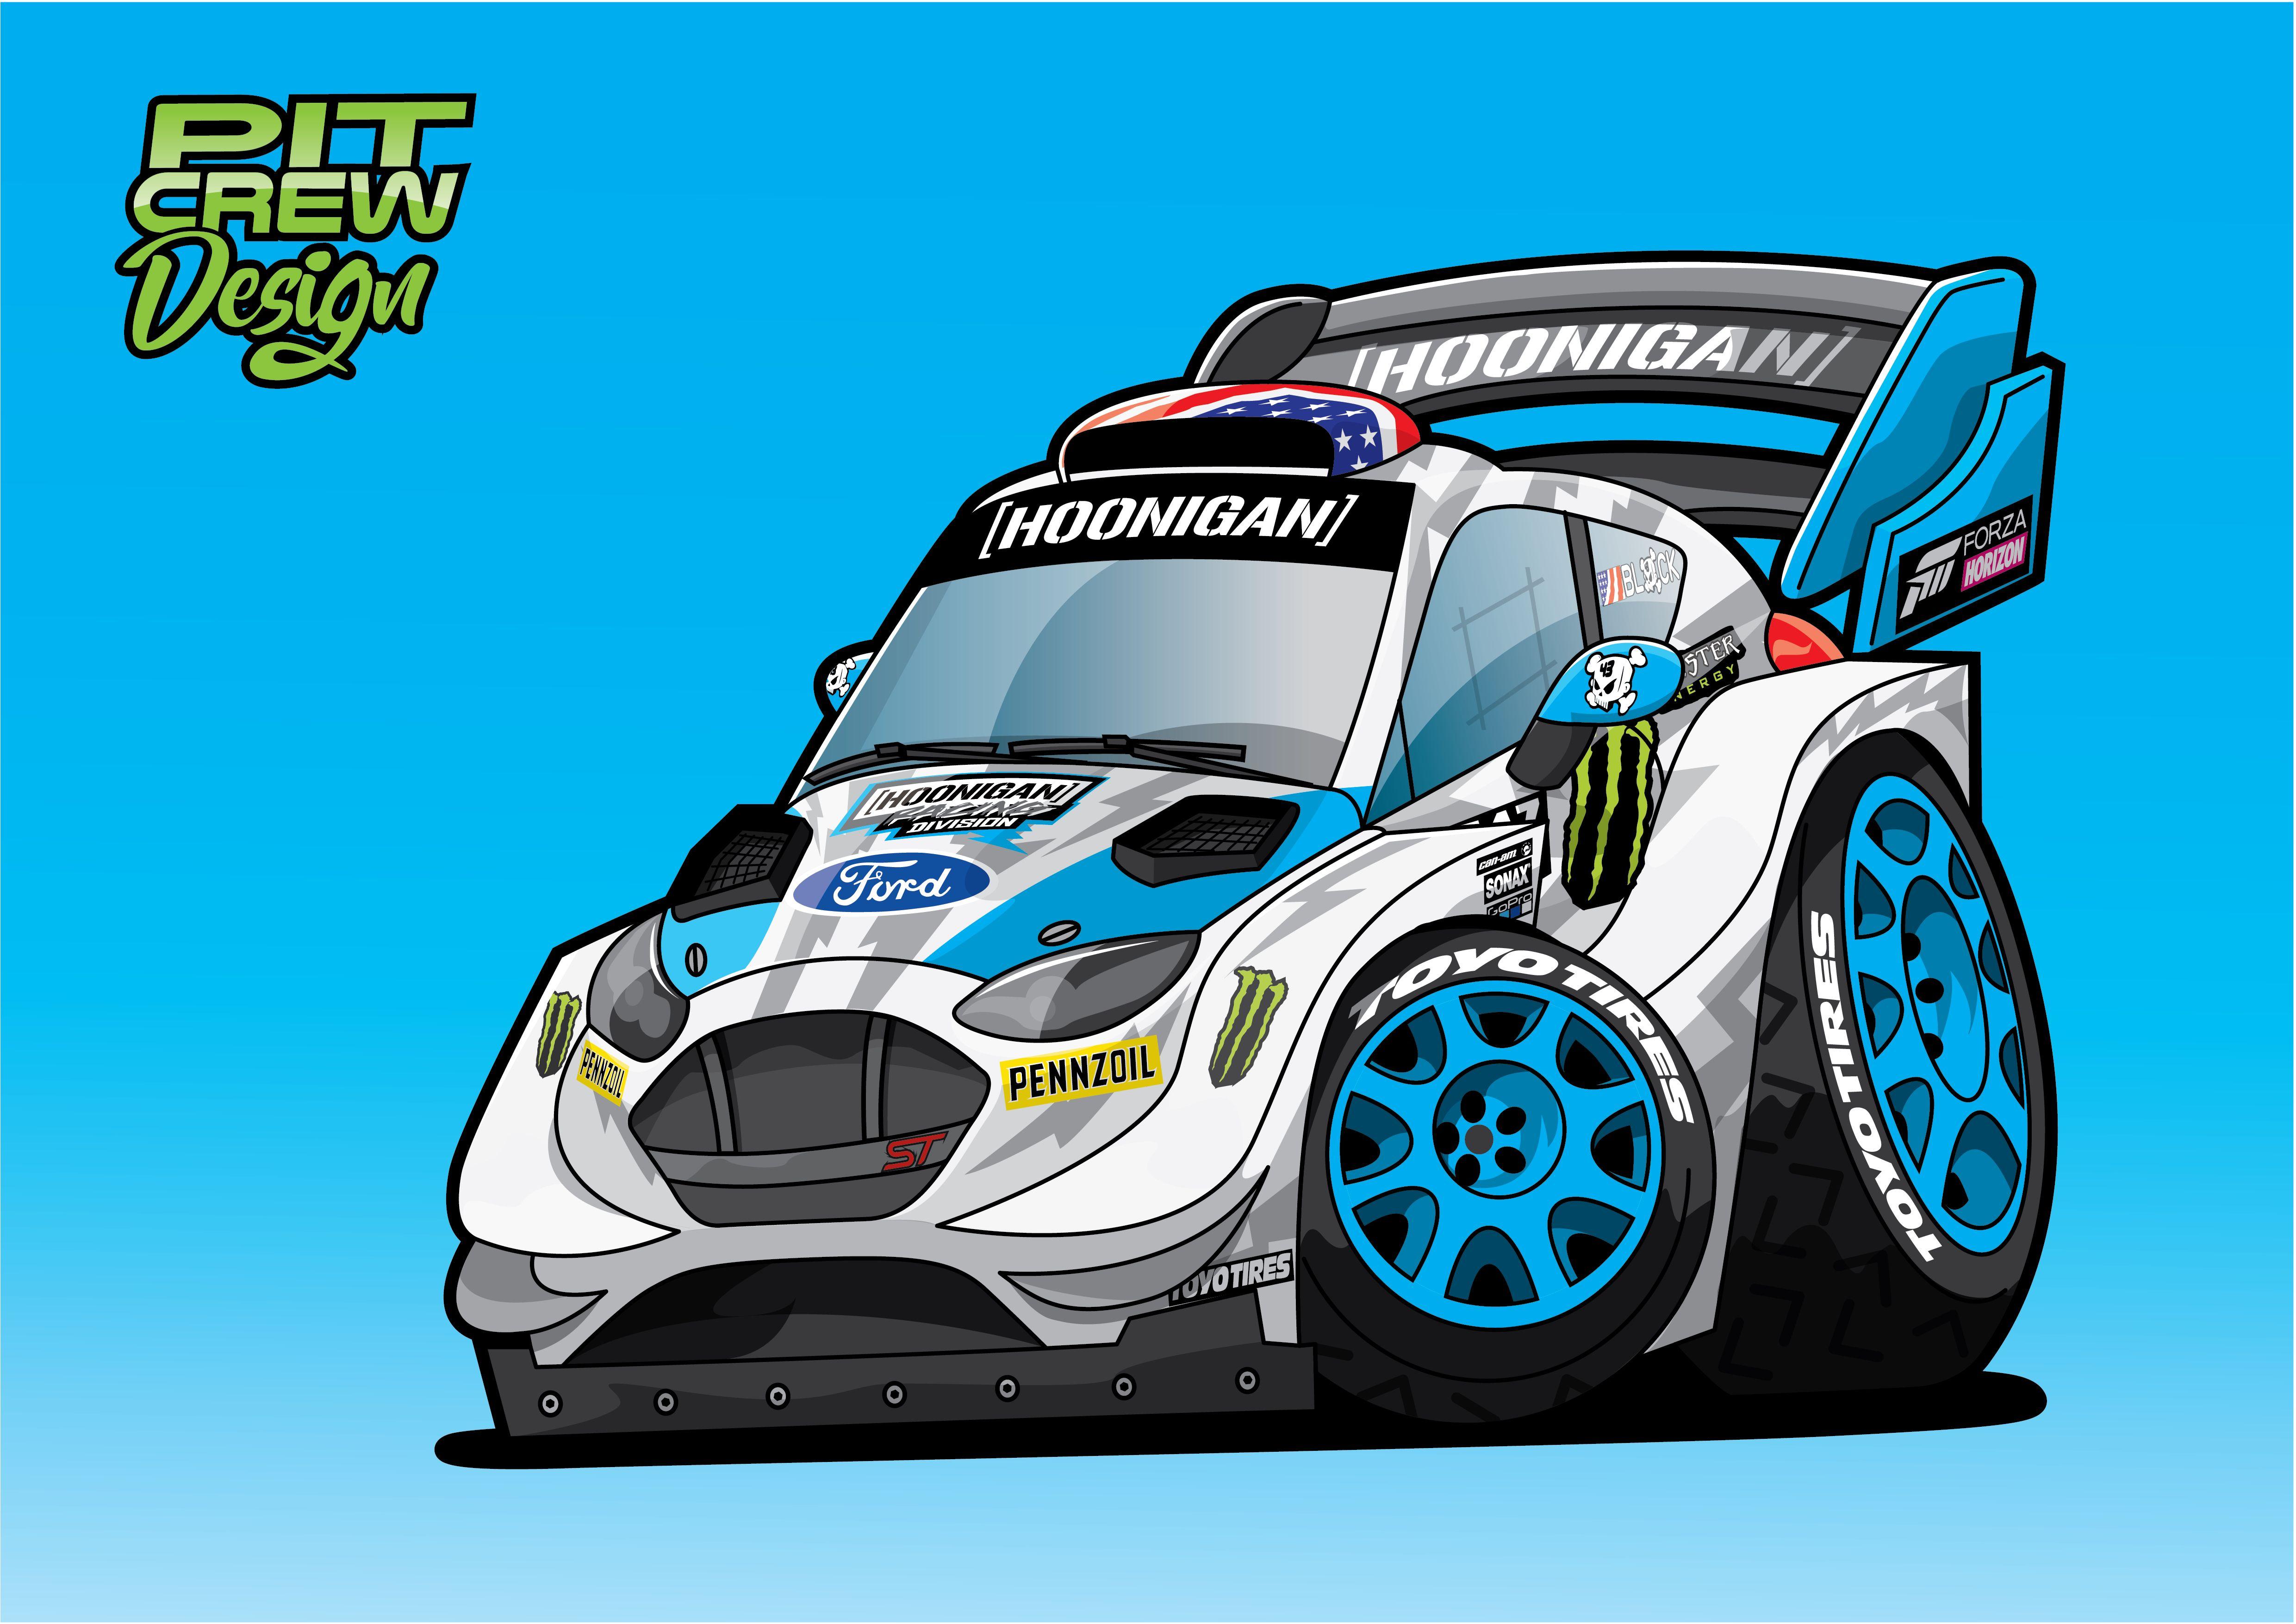 Ken Blocks Wrc Ford Fiesta Cartoon Car Cartoon Classic Cars Birthday Party Car Illustration